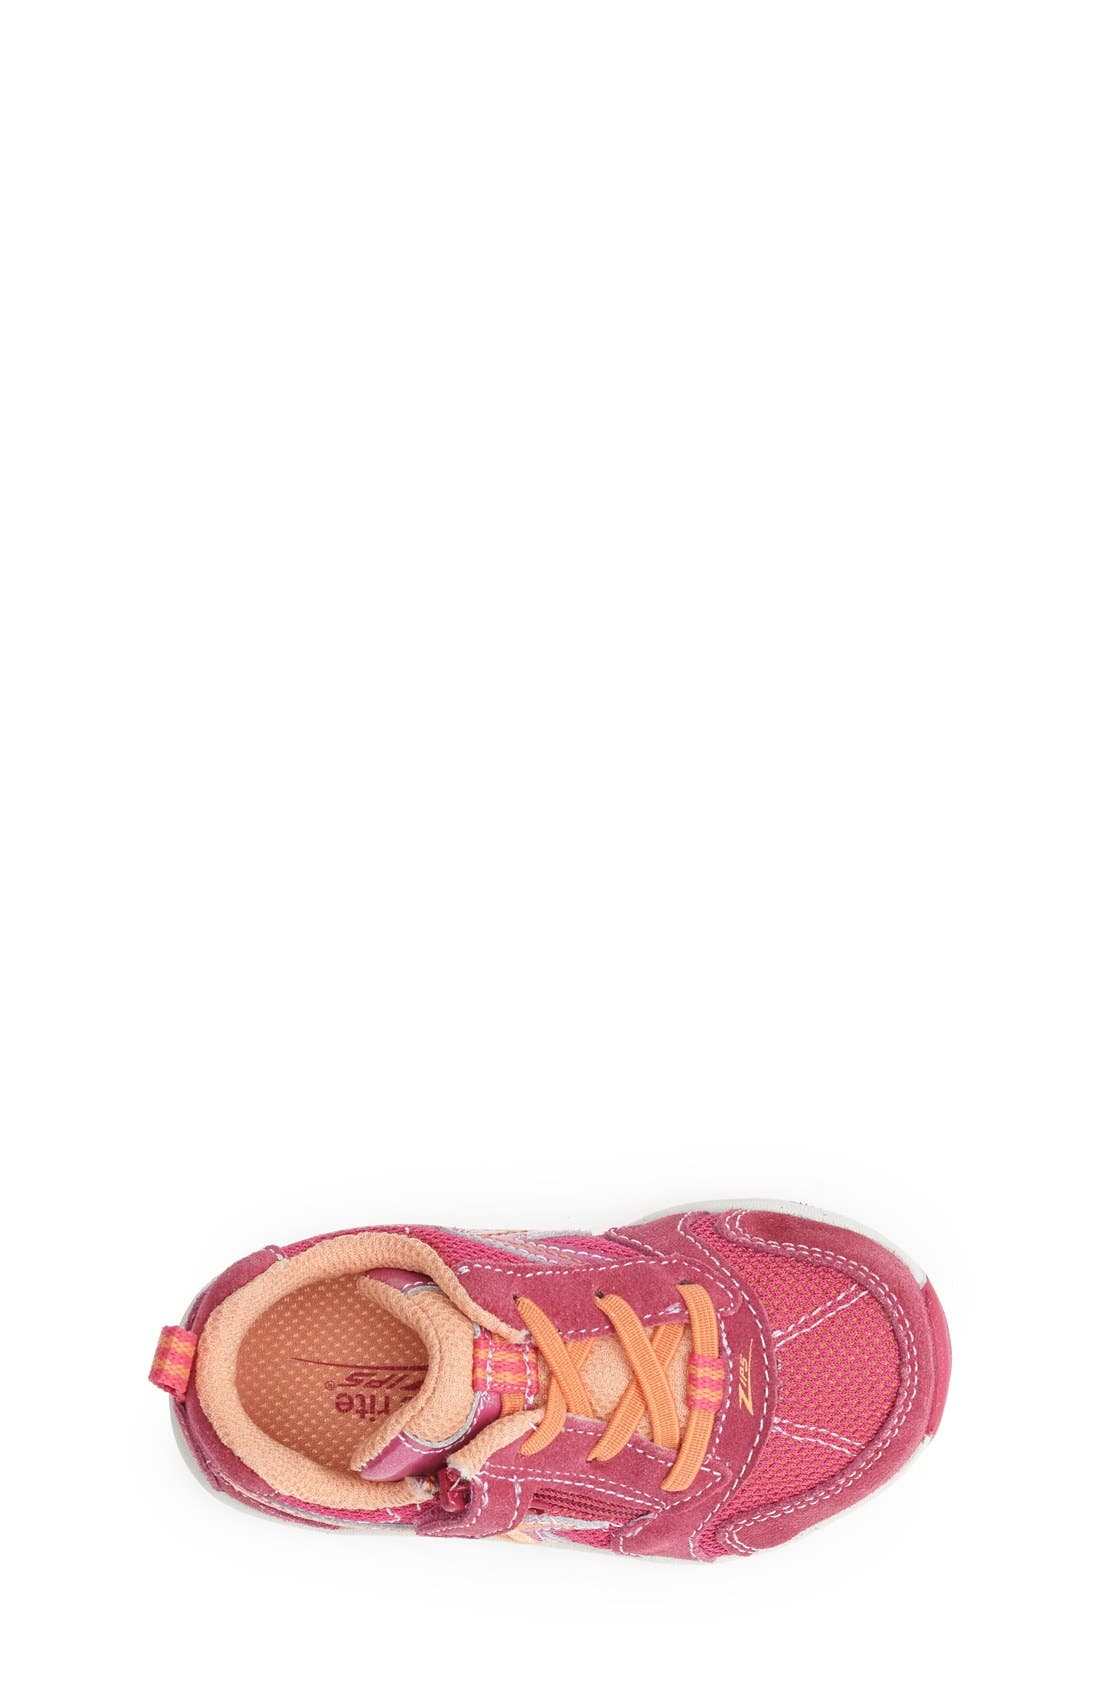 Alternate Image 3  - Stride Rite 'Zips' Sneaker (Walker & Toddler)